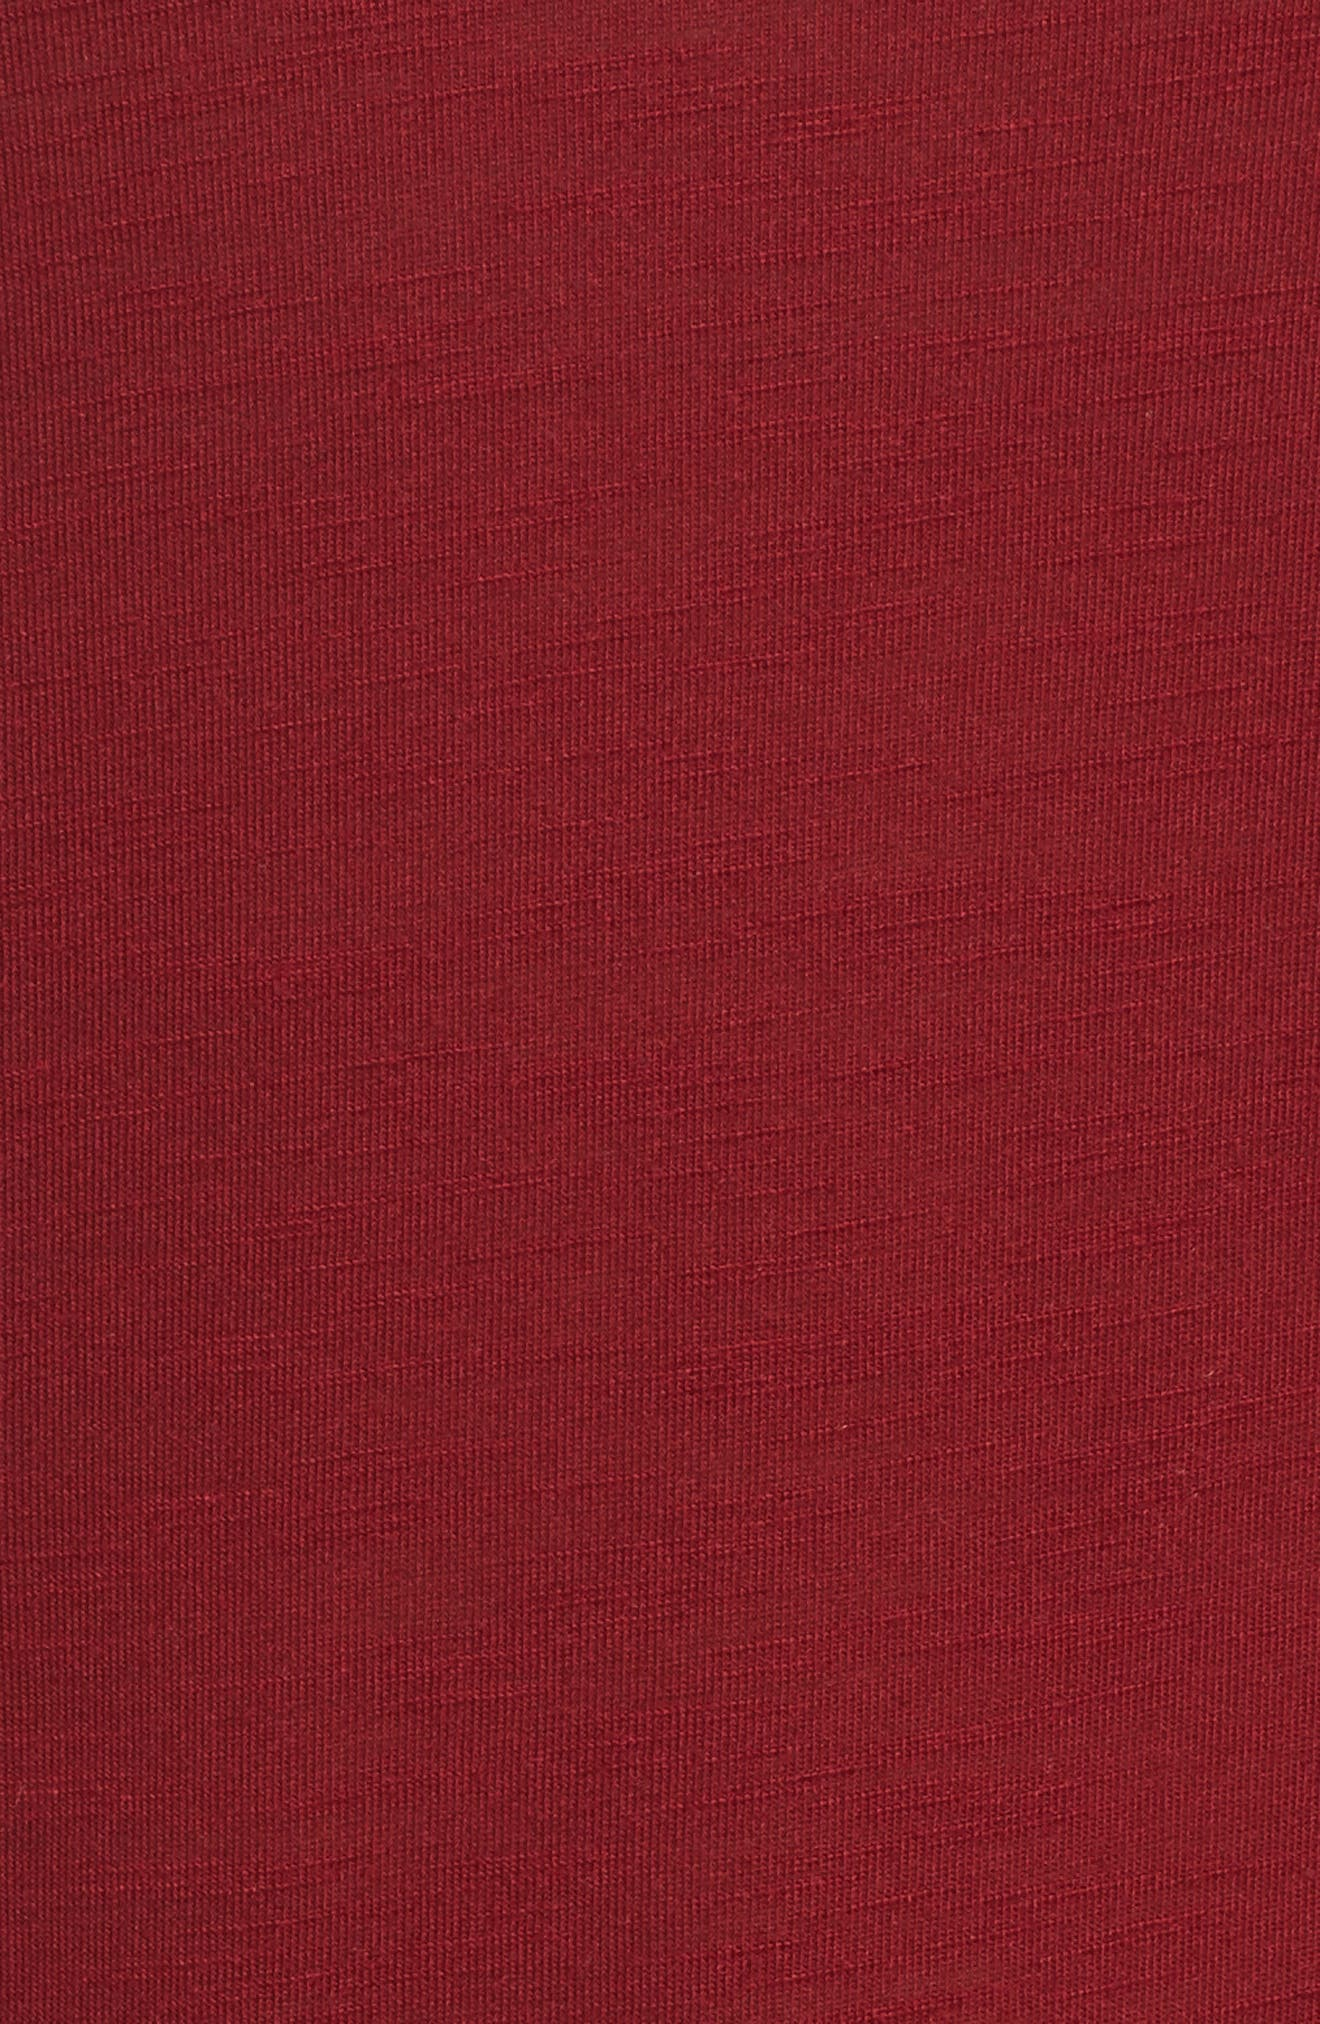 Originals Long Sleeve Tee,                             Alternate thumbnail 6, color,                             600